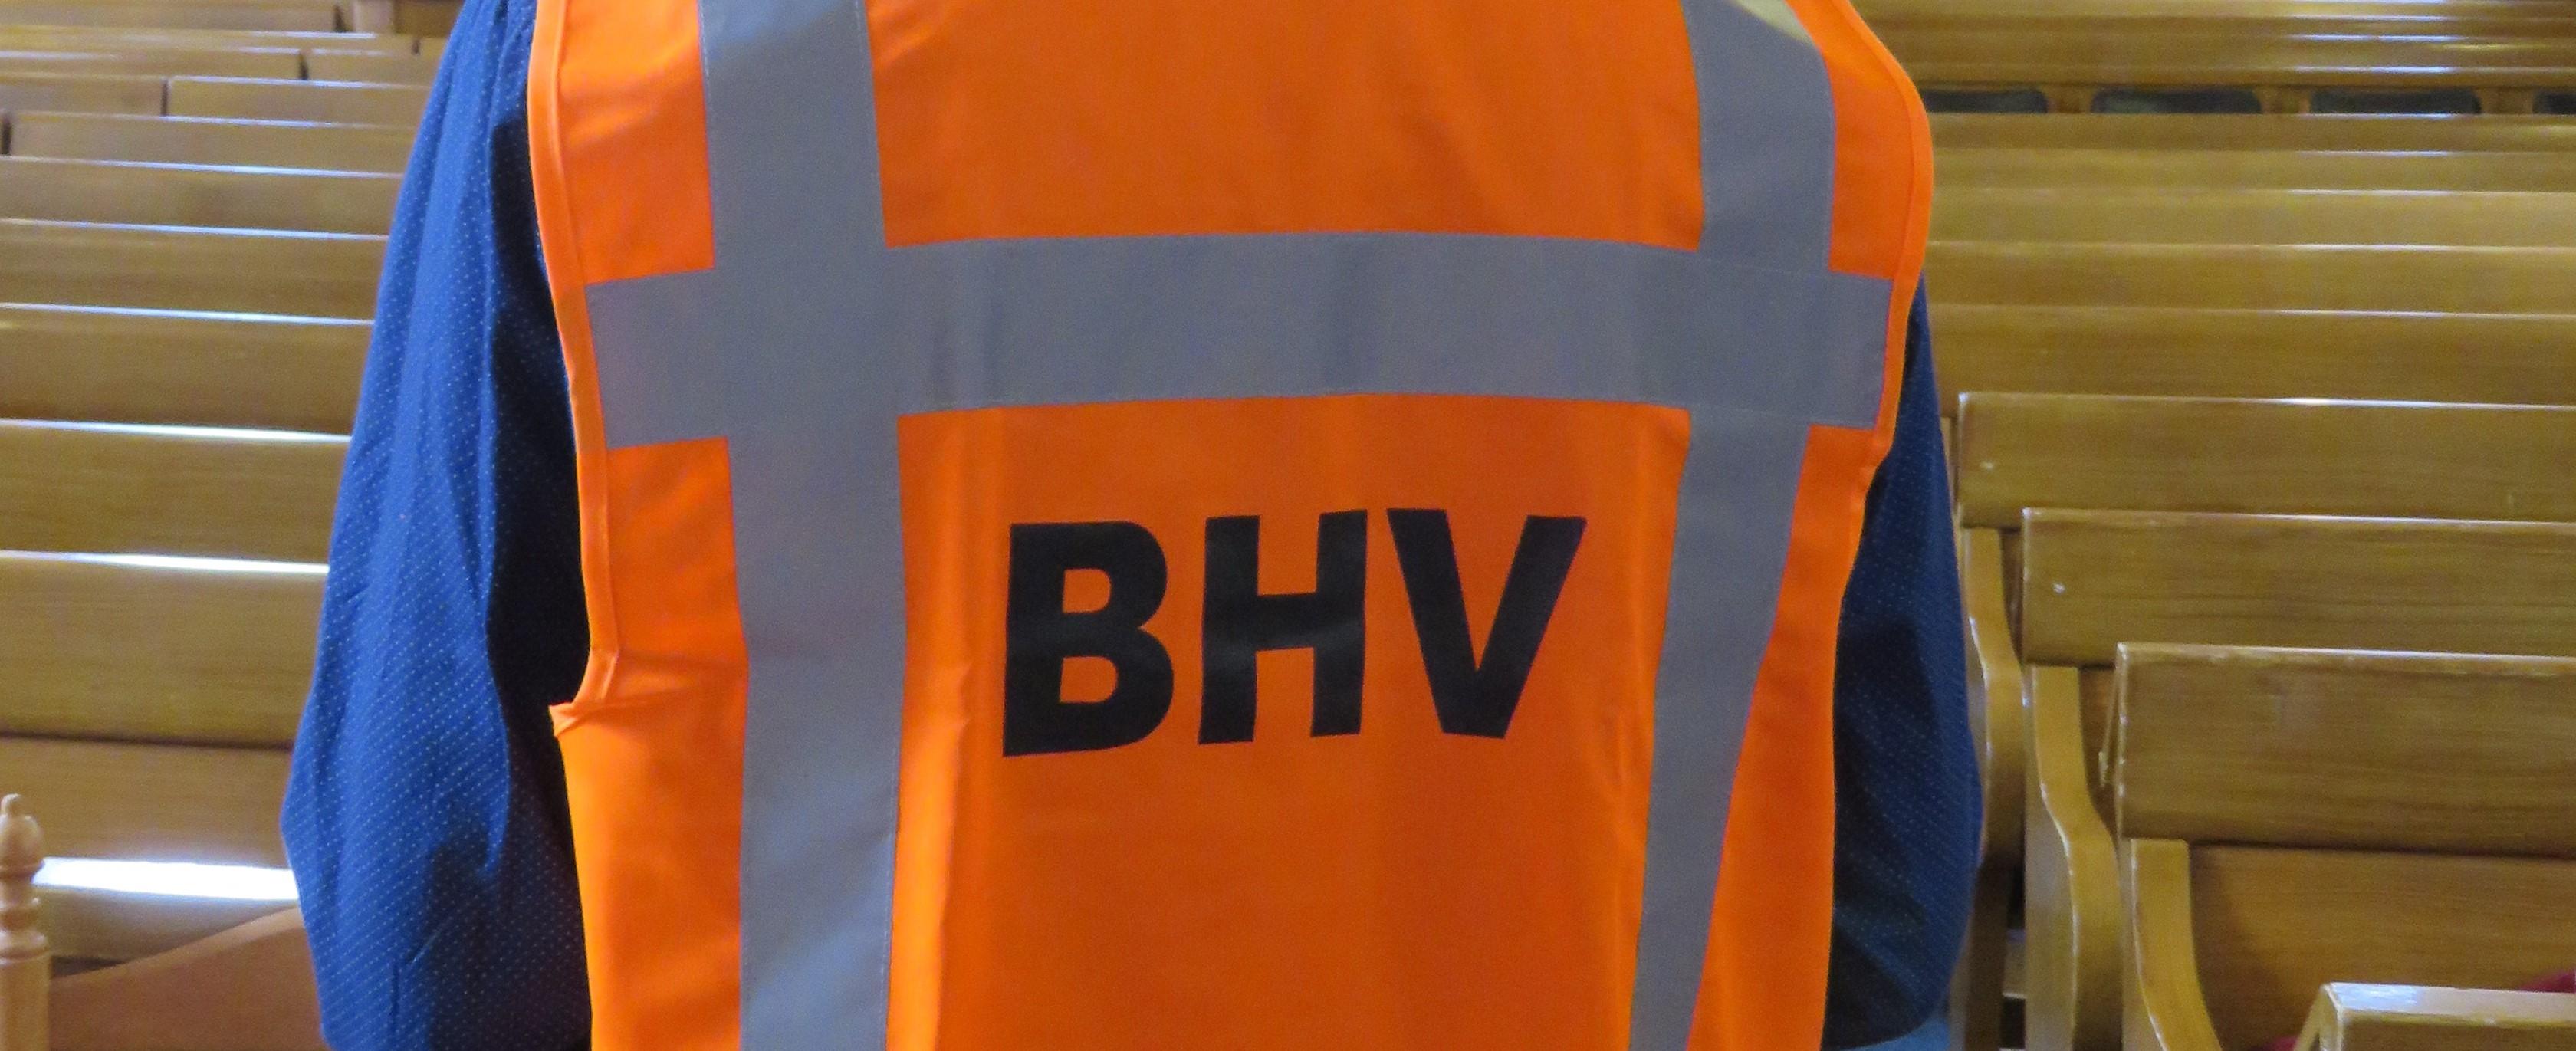 Bedrijfshulpverlening (BHV)